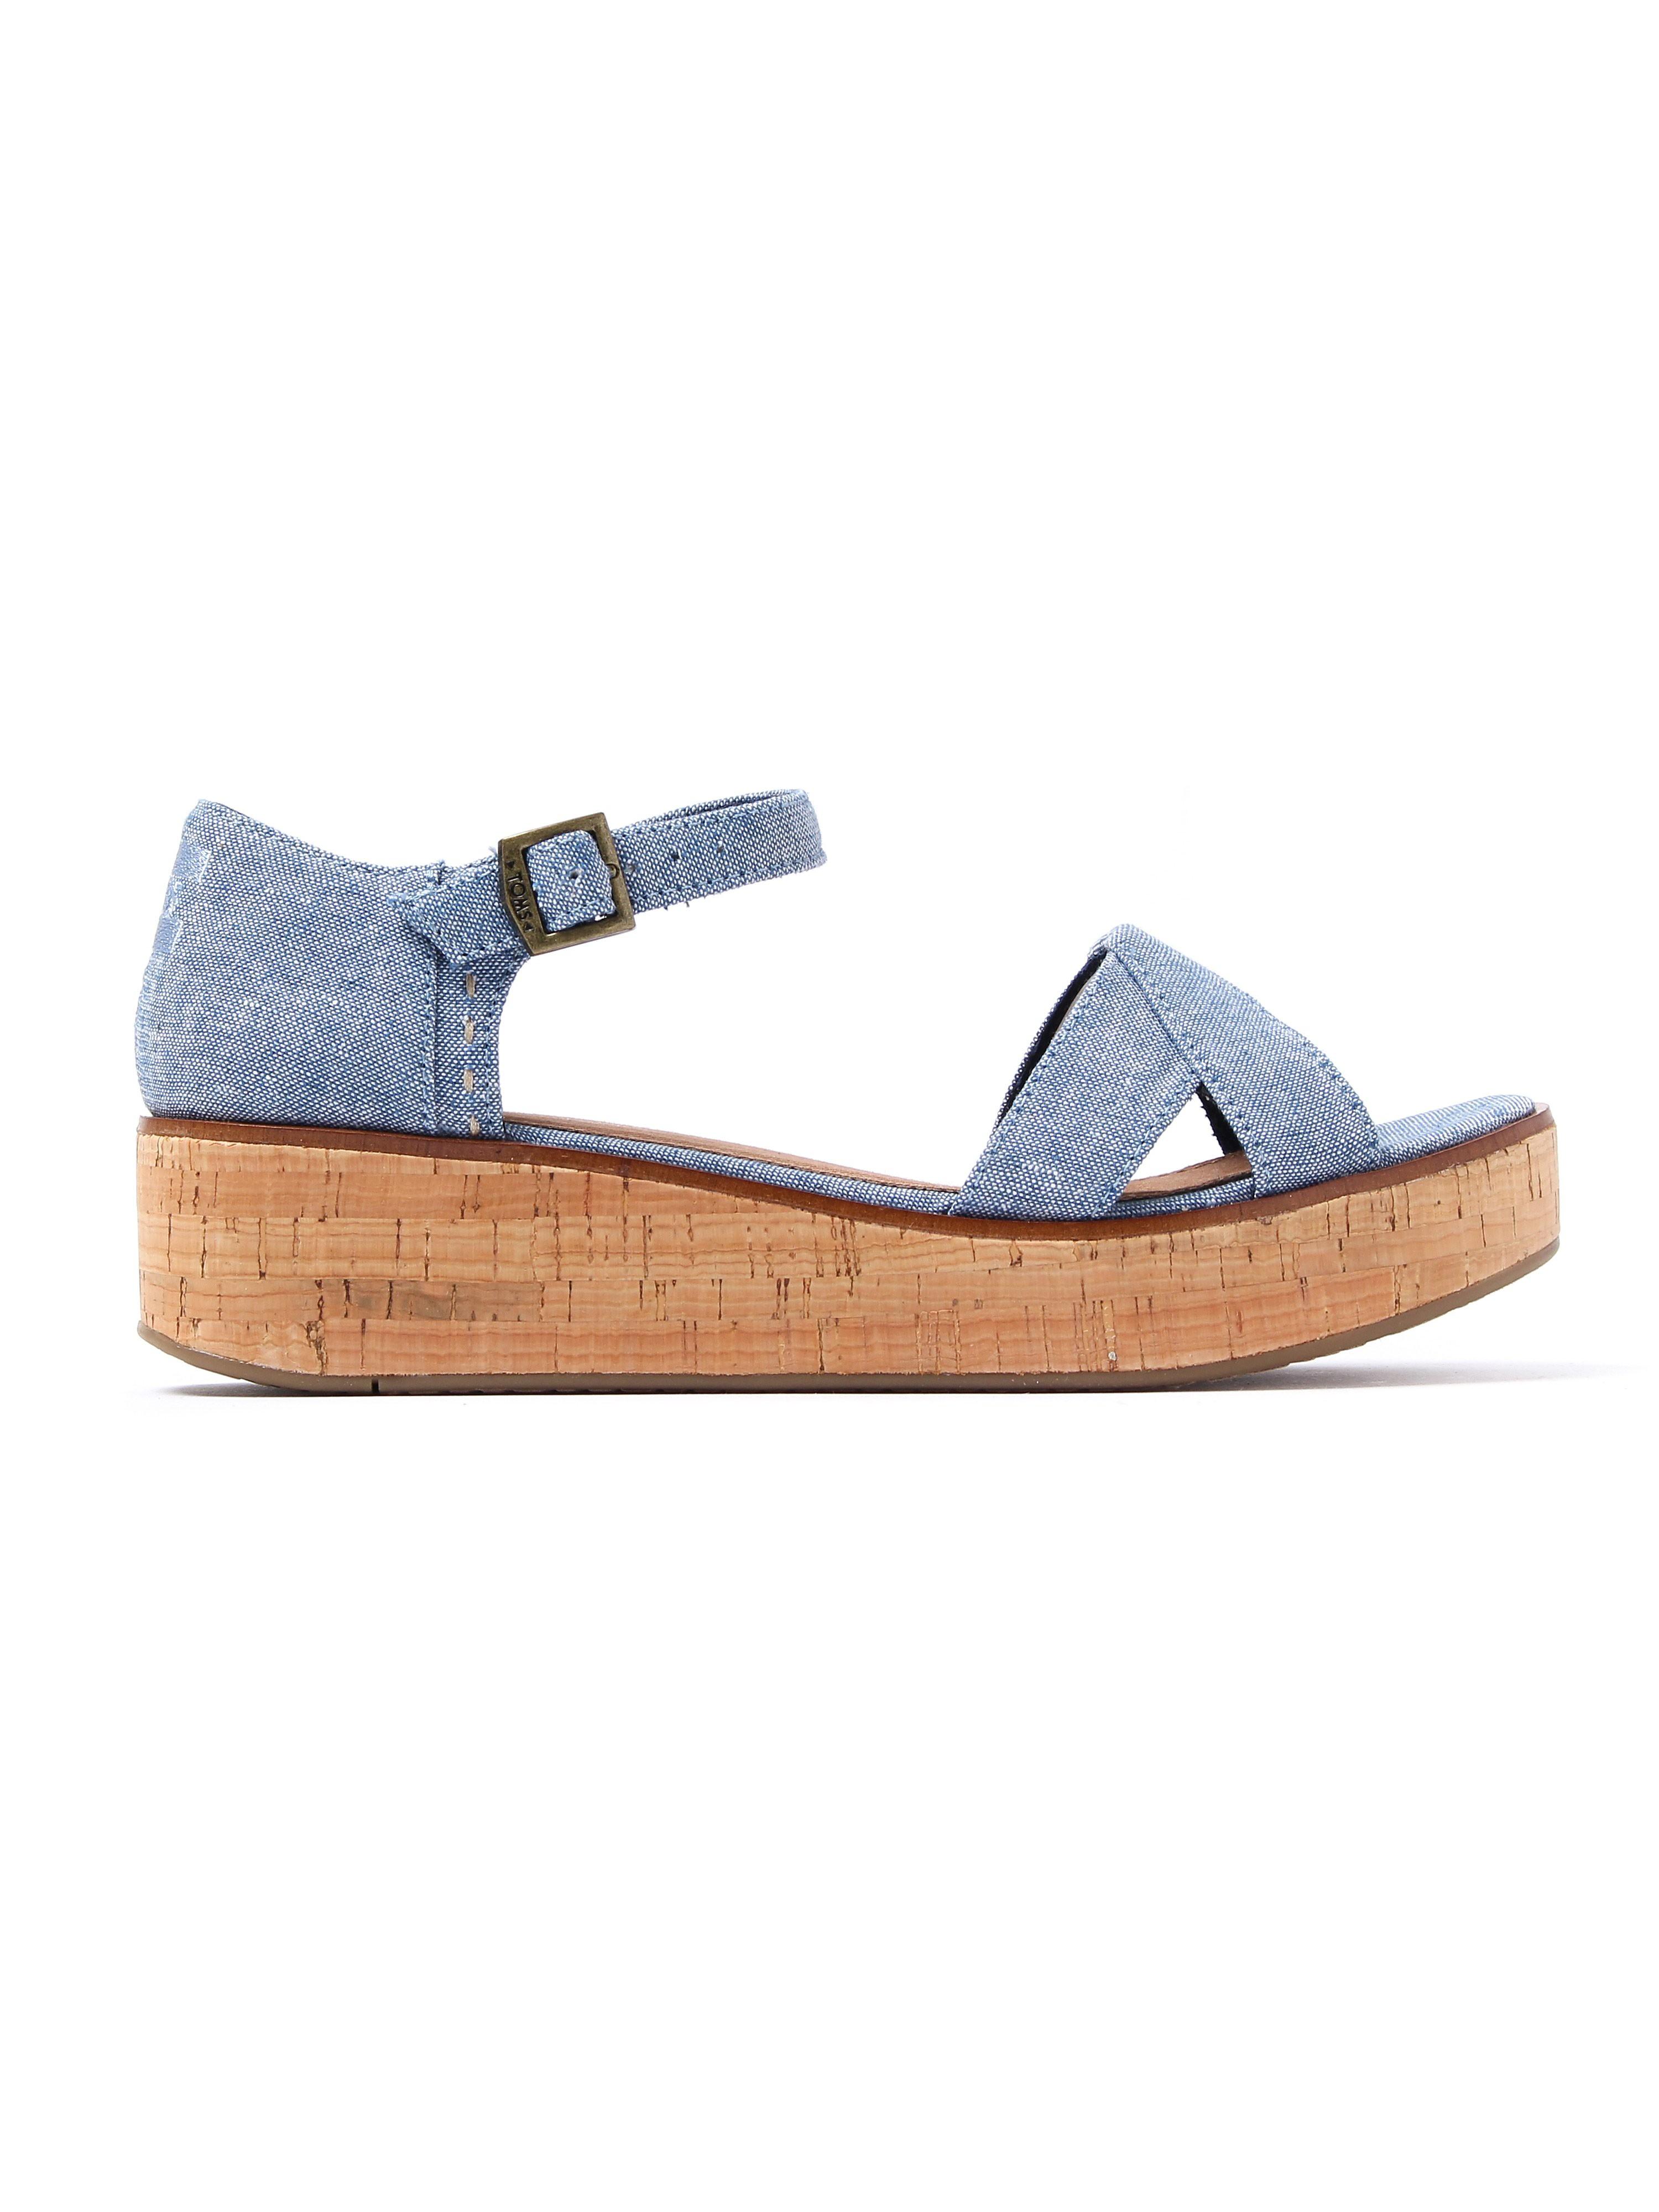 Toms Women's Harper Wedge Sandals - Blue Chambray